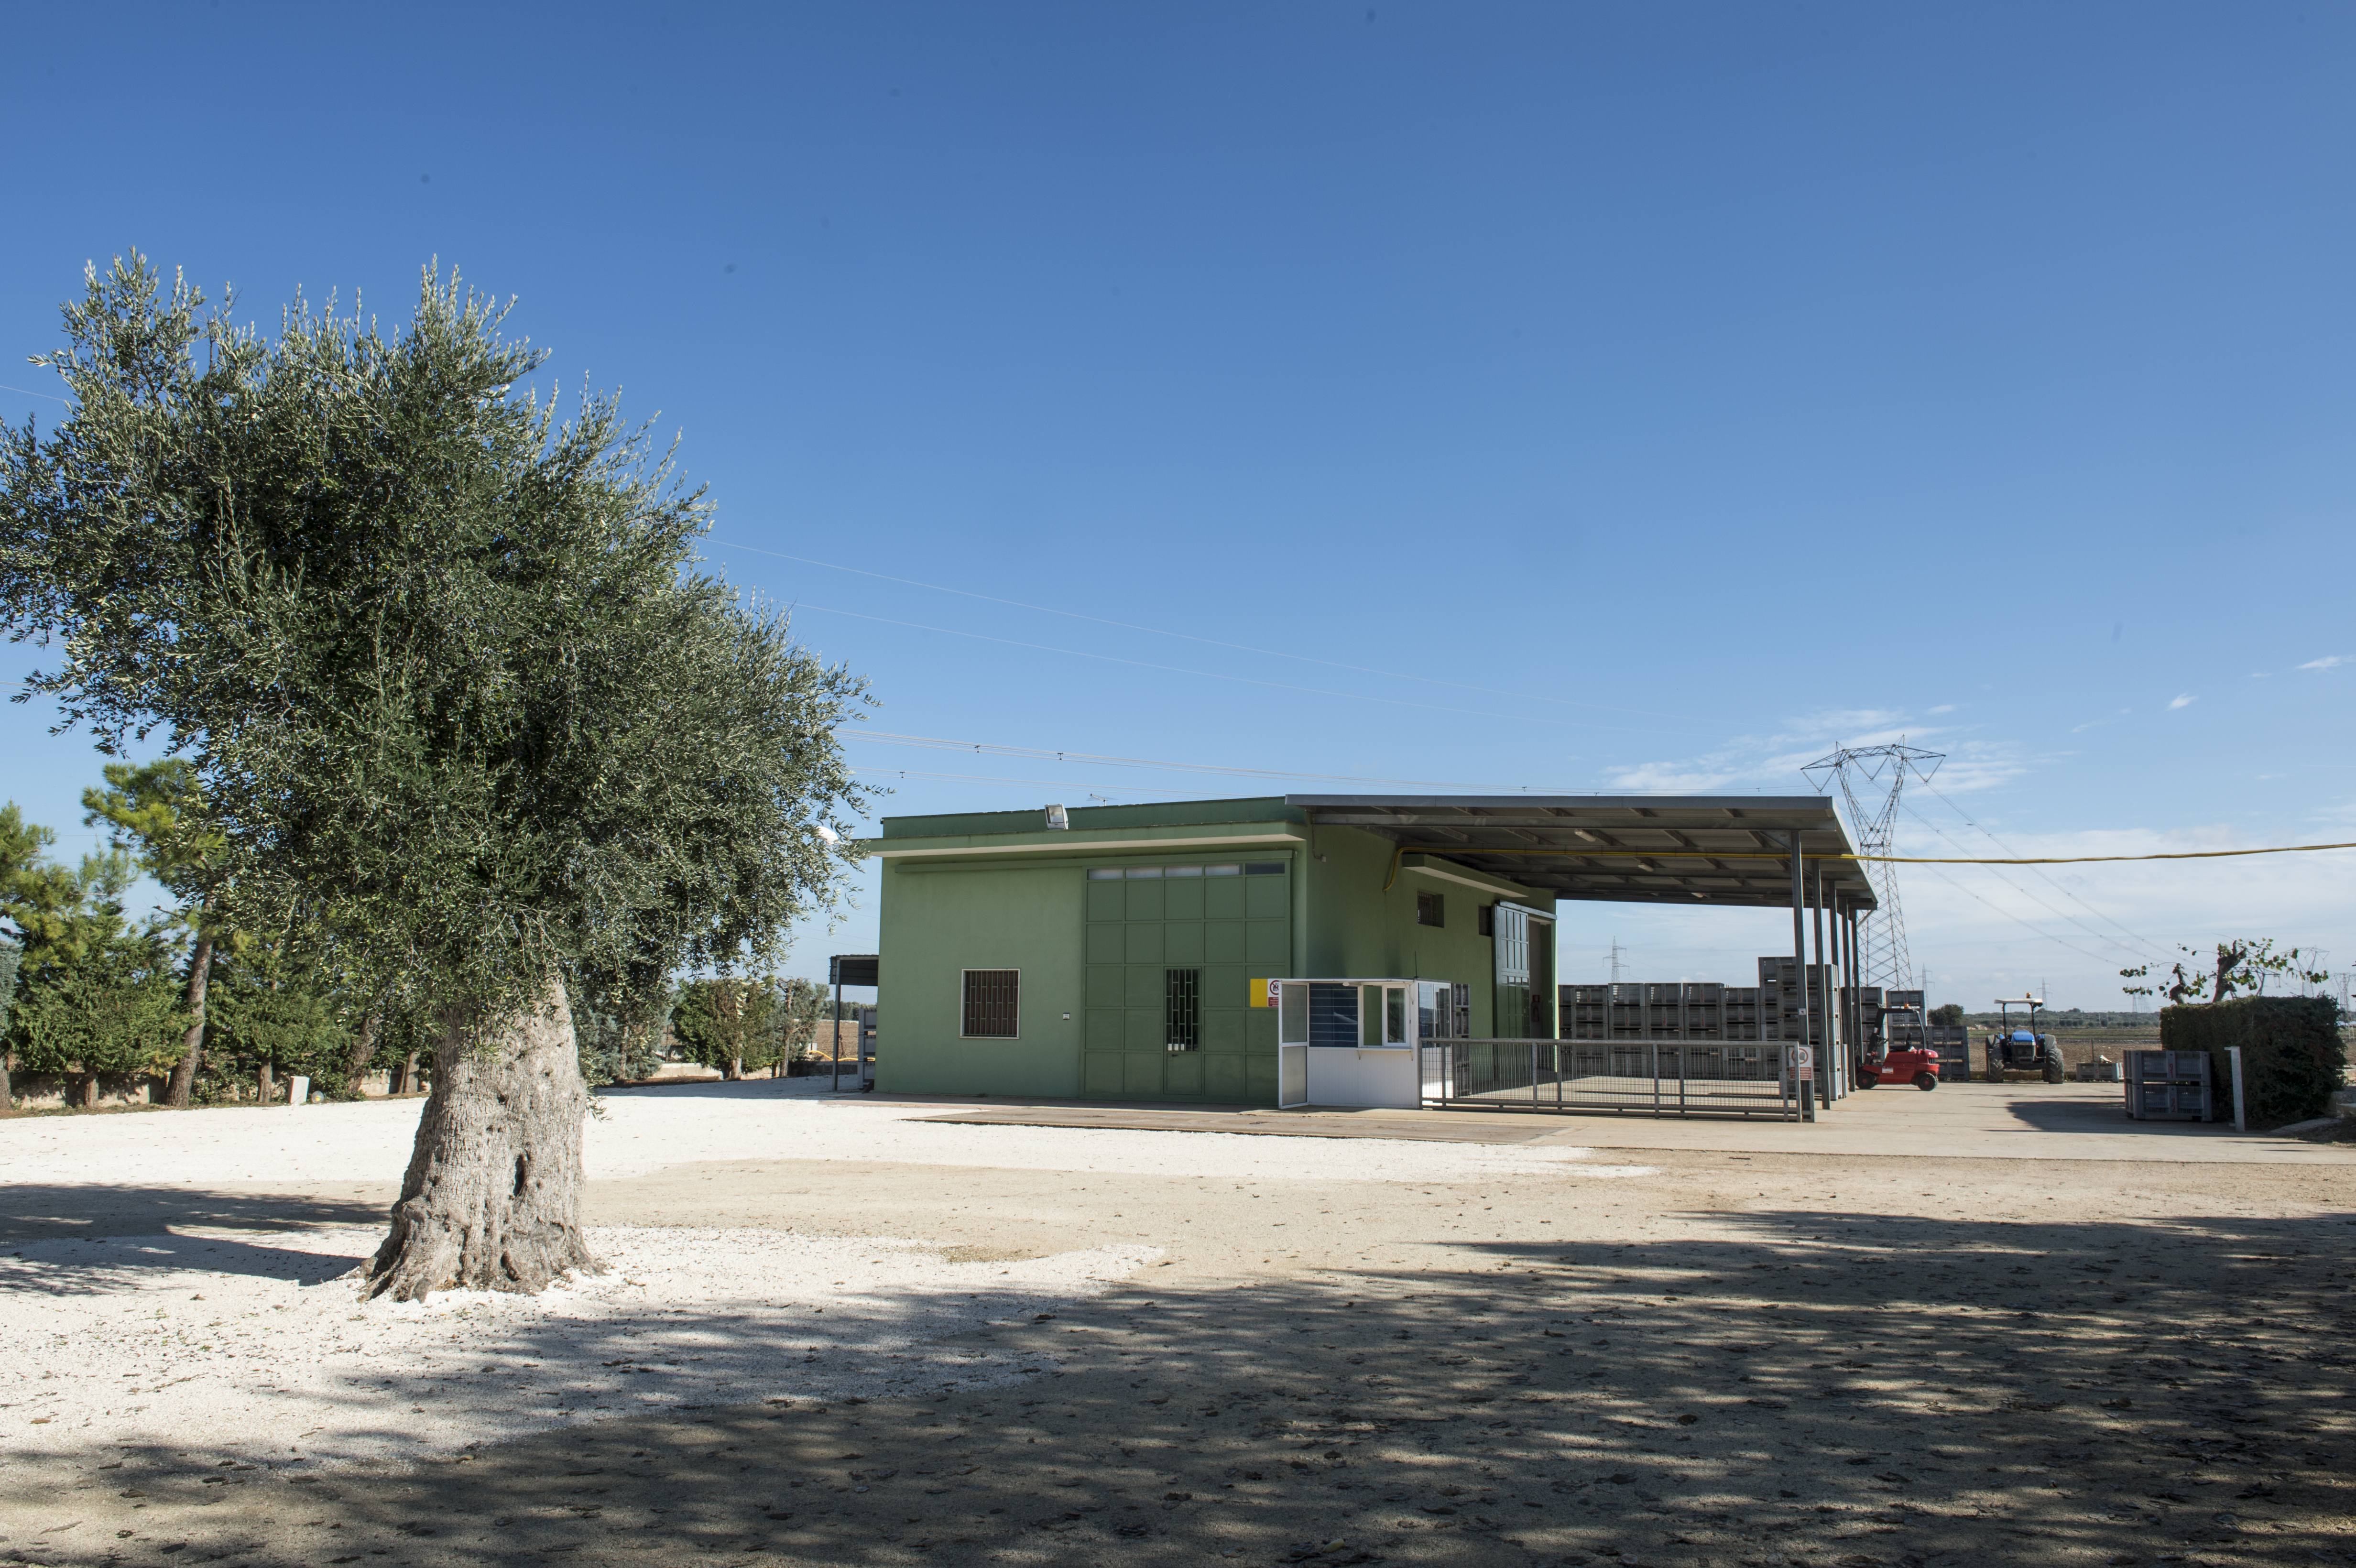 olivo Sant'oro